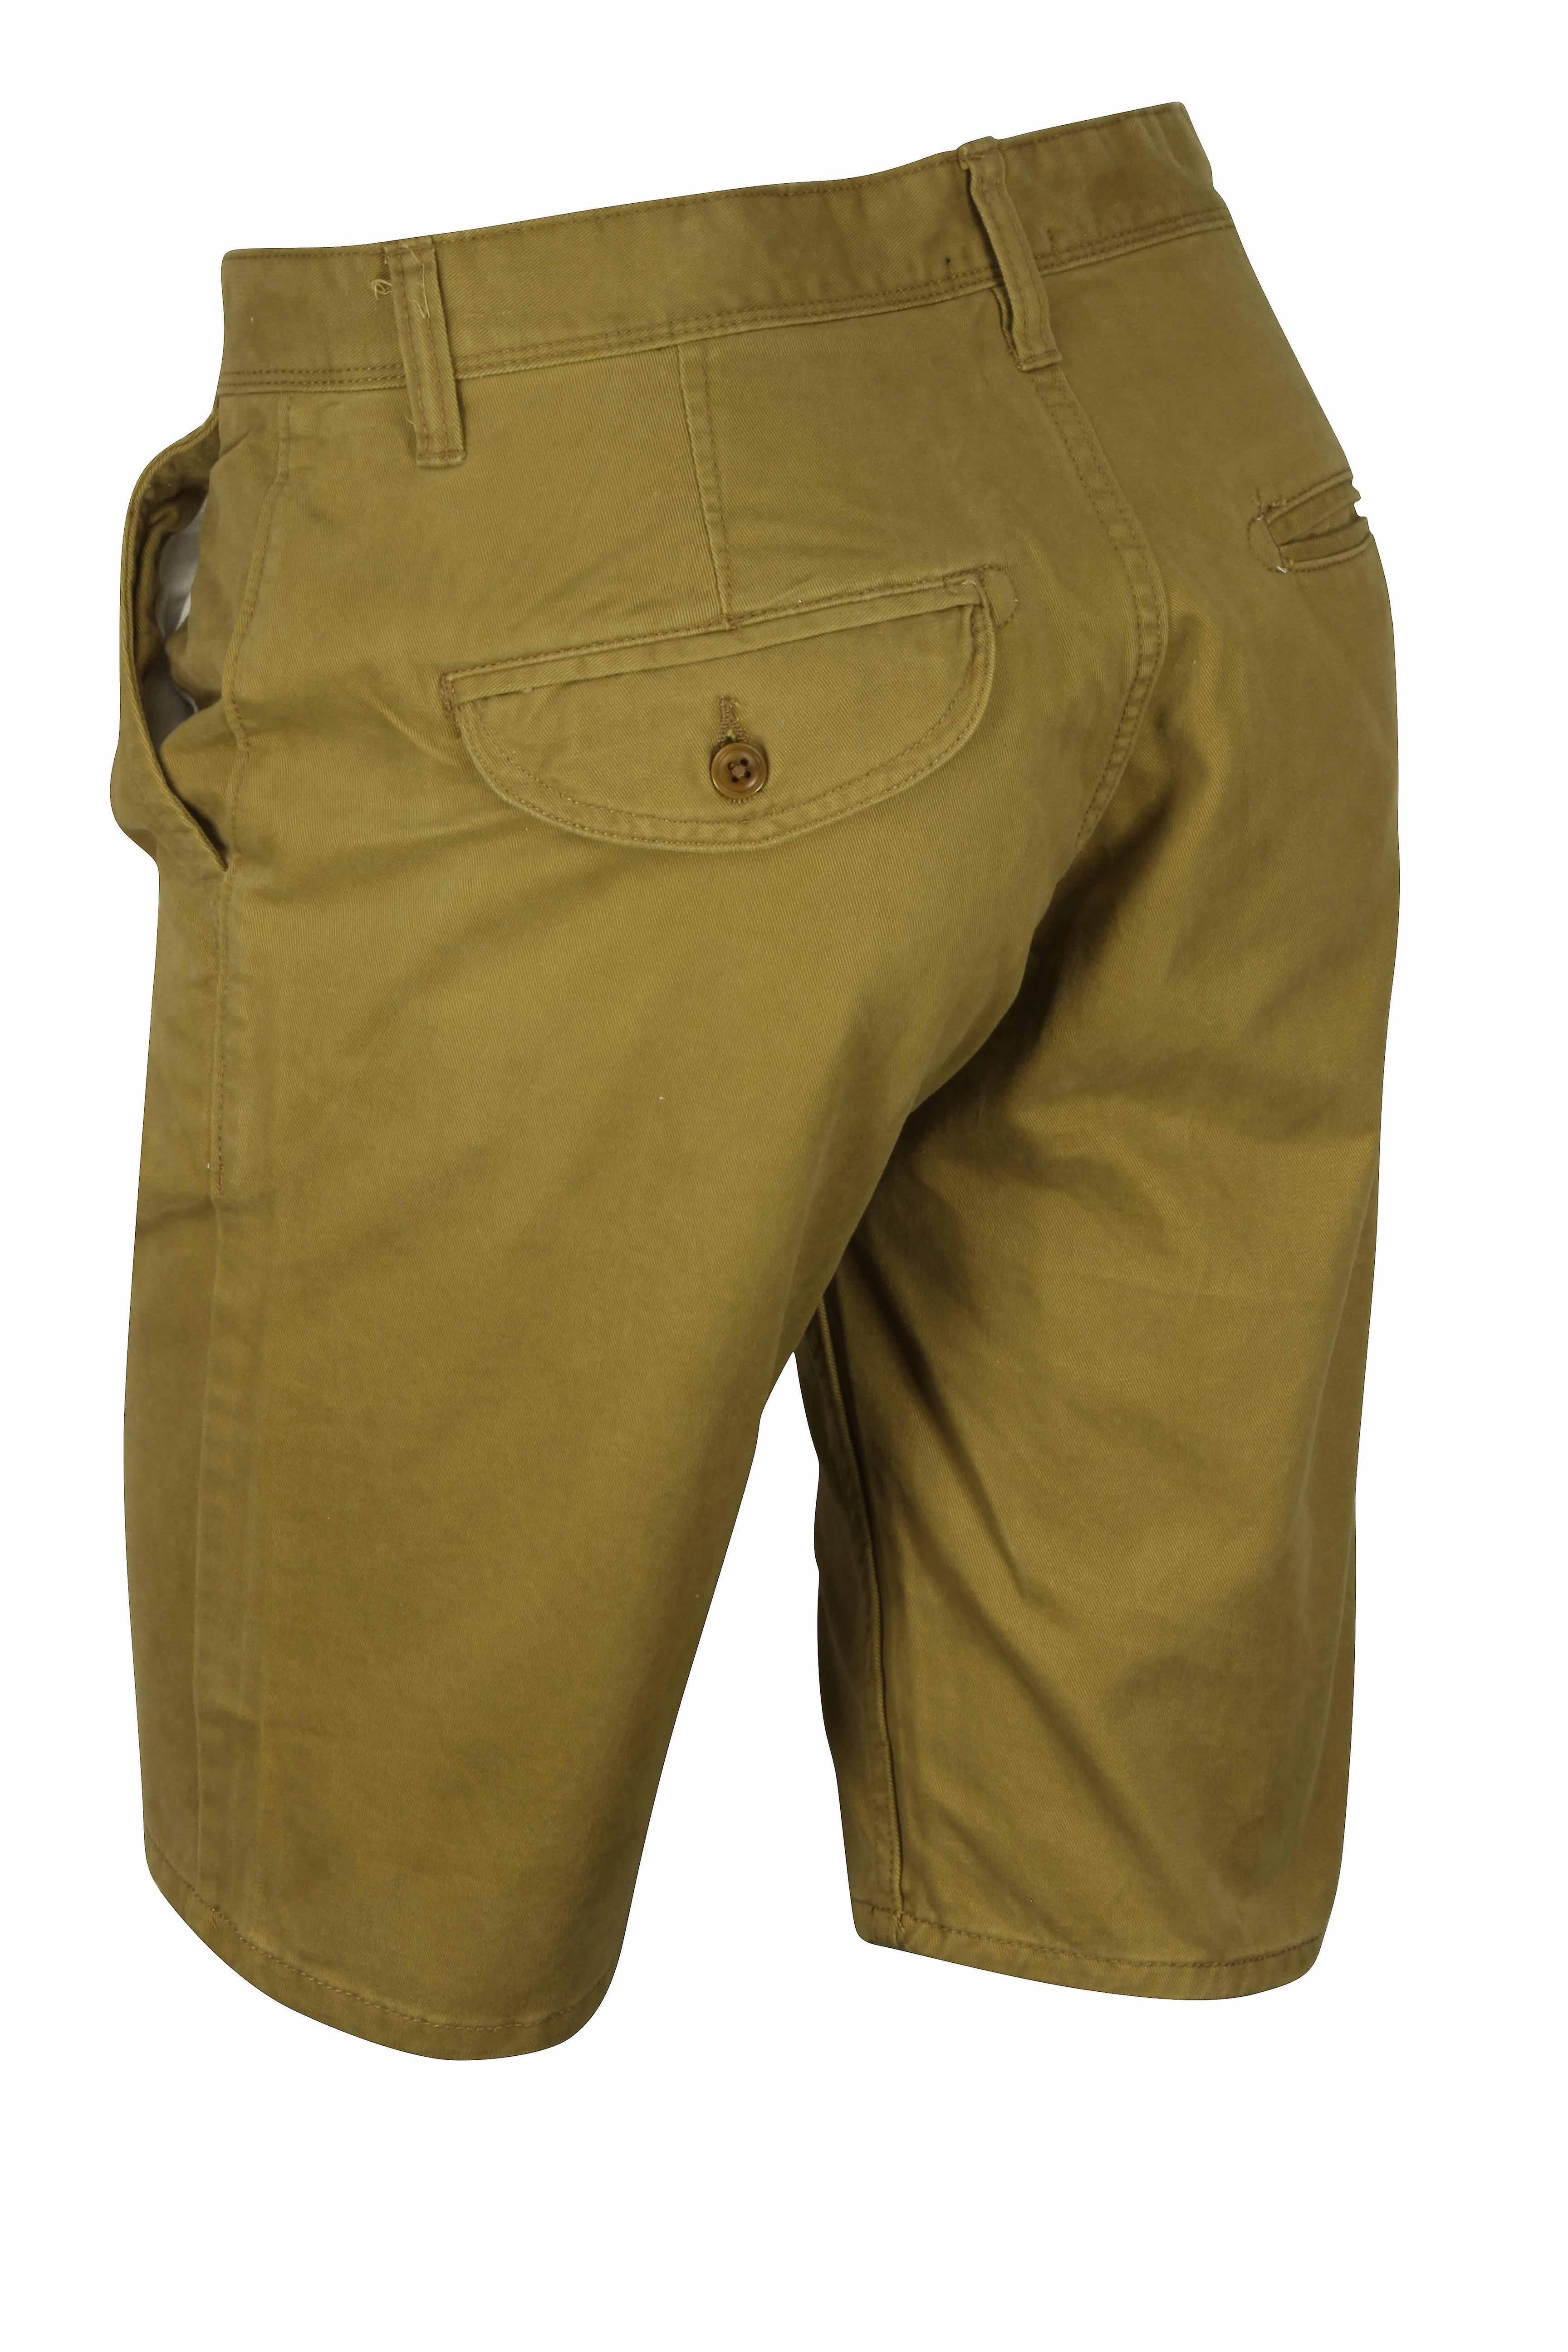 Quiksilver Mens Everyday Chino Casual Shorts - Khaki Brown